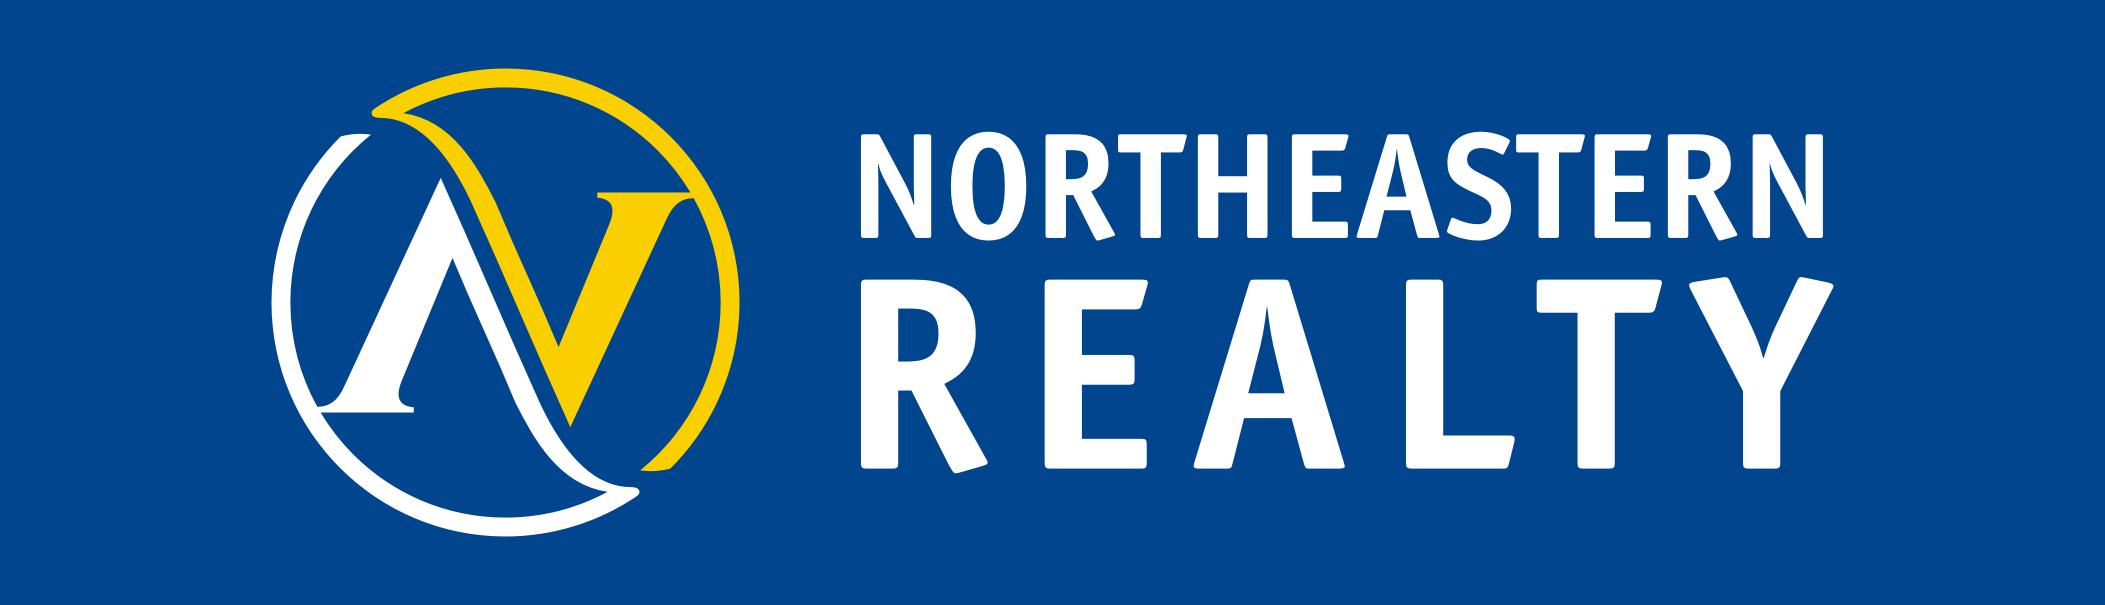 Northeastern Realty LLC ||